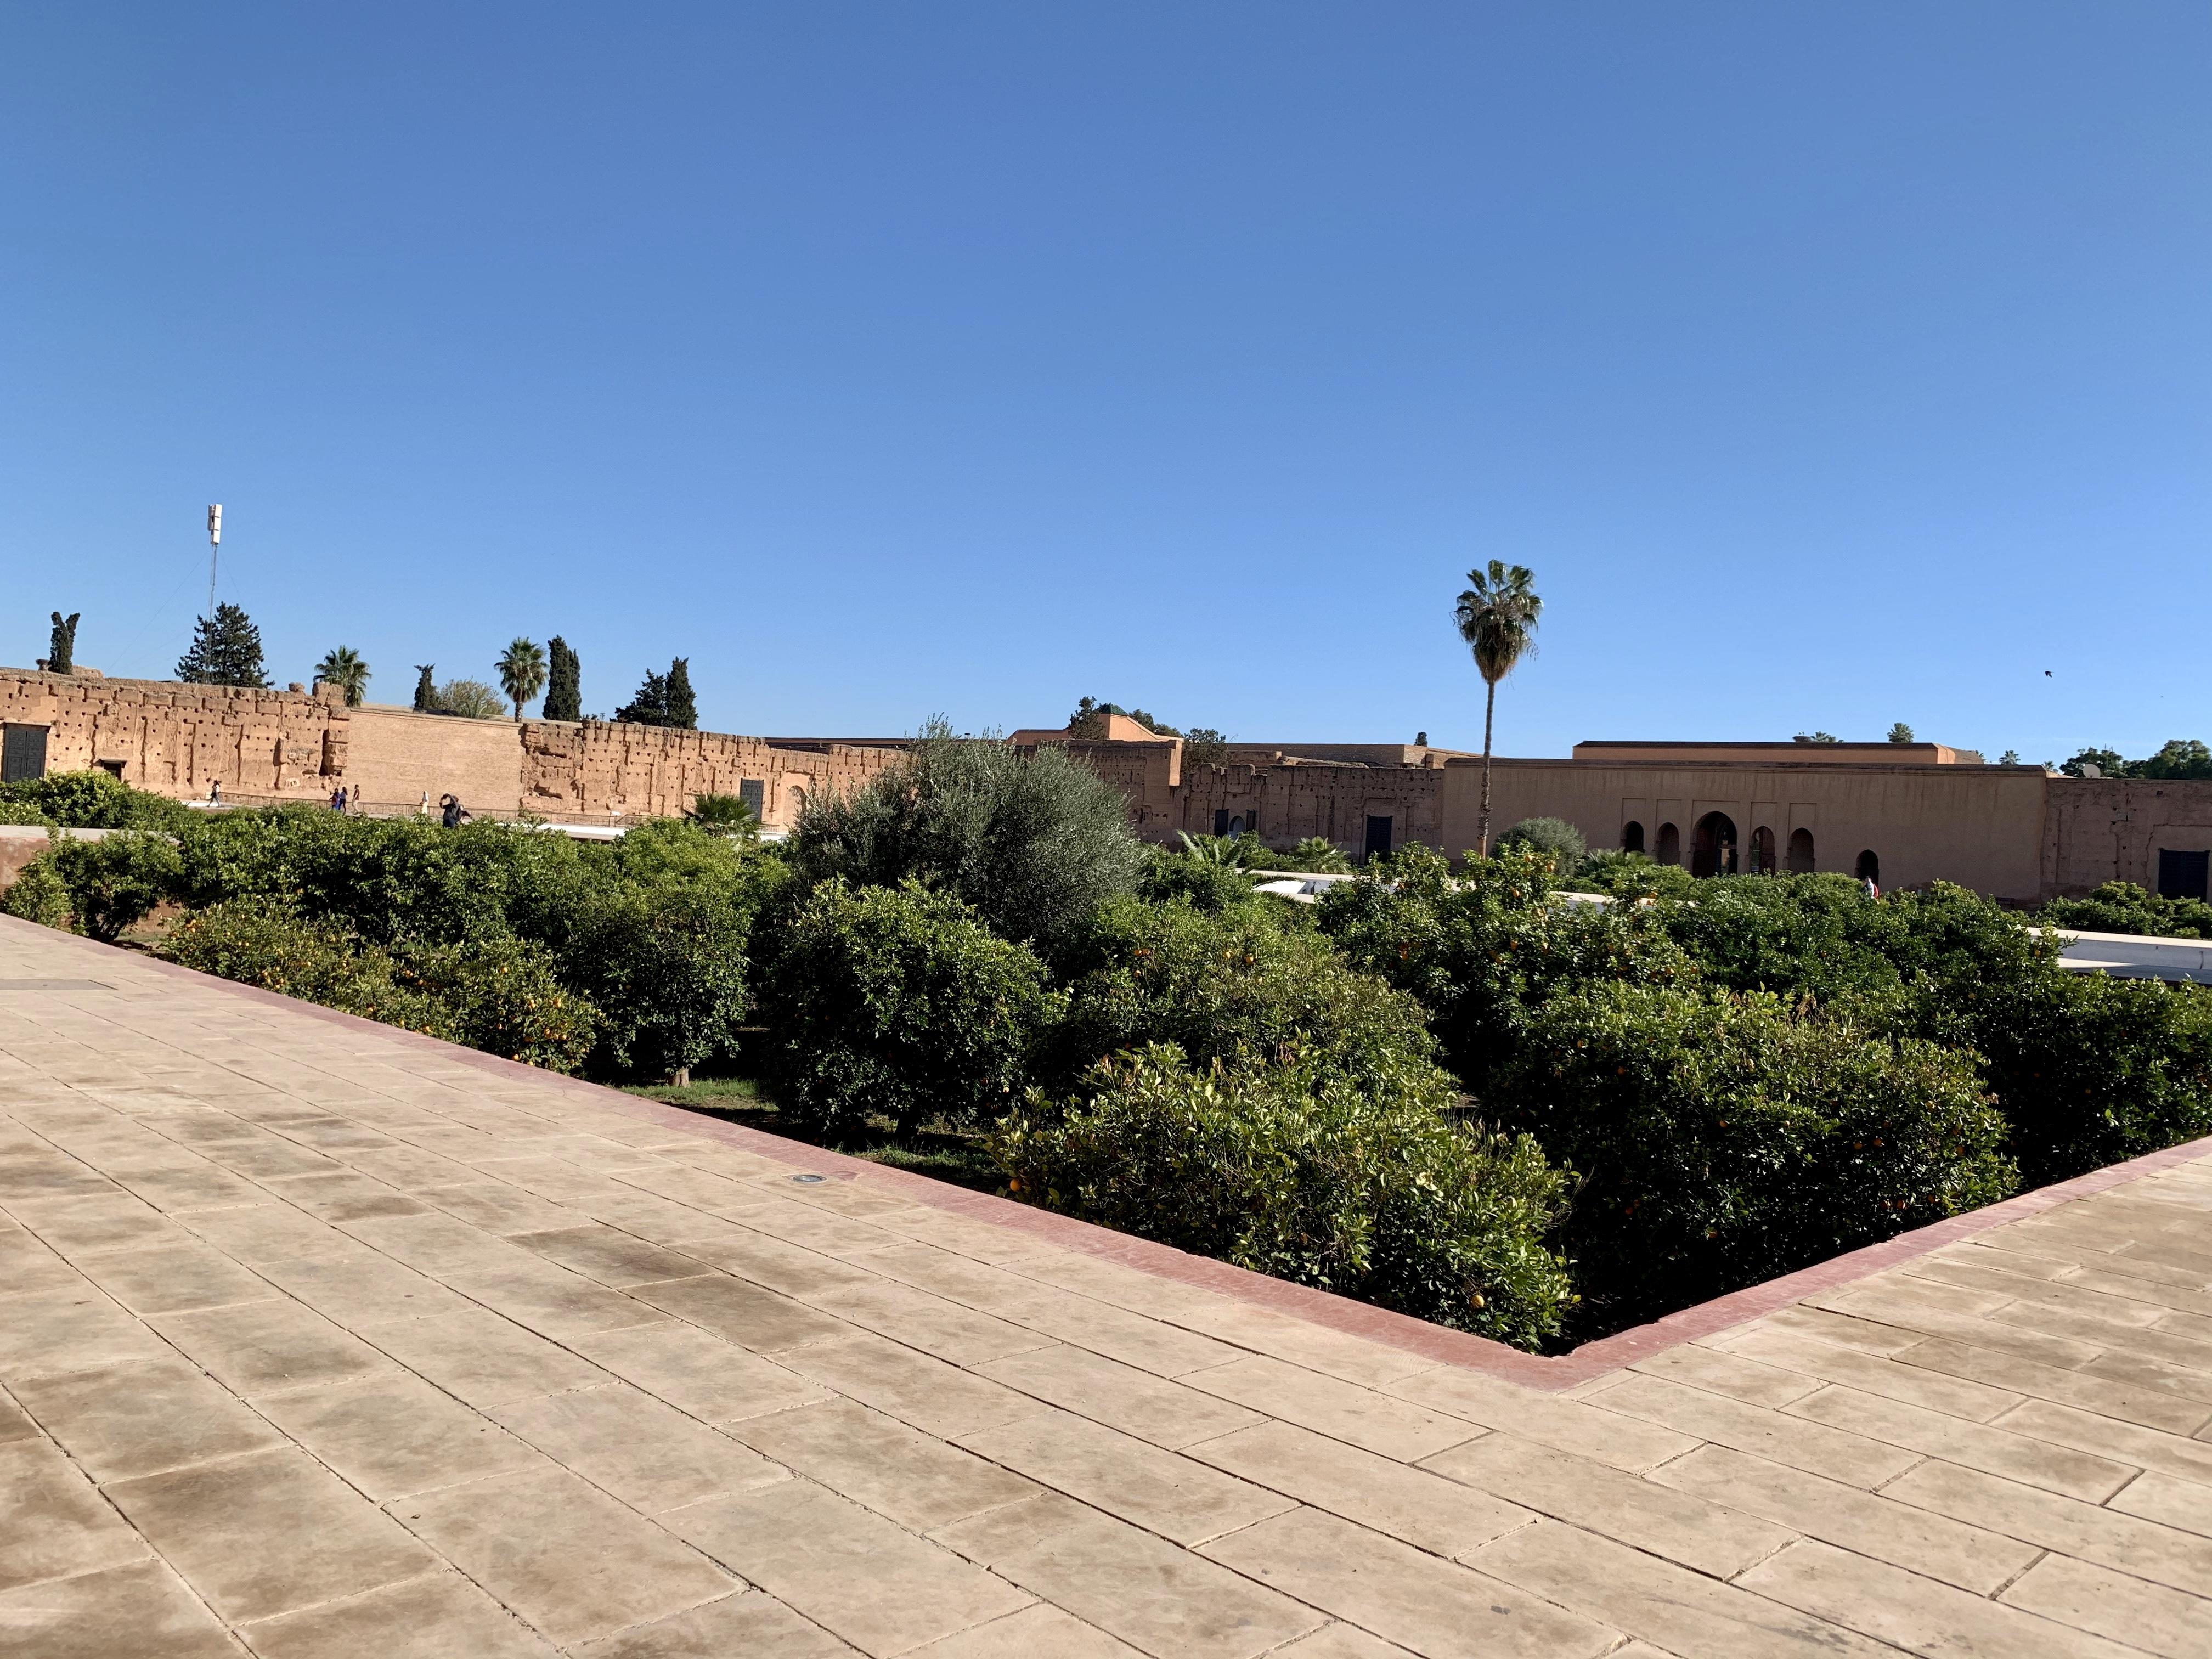 img 5879 - Marrakech, Morocco